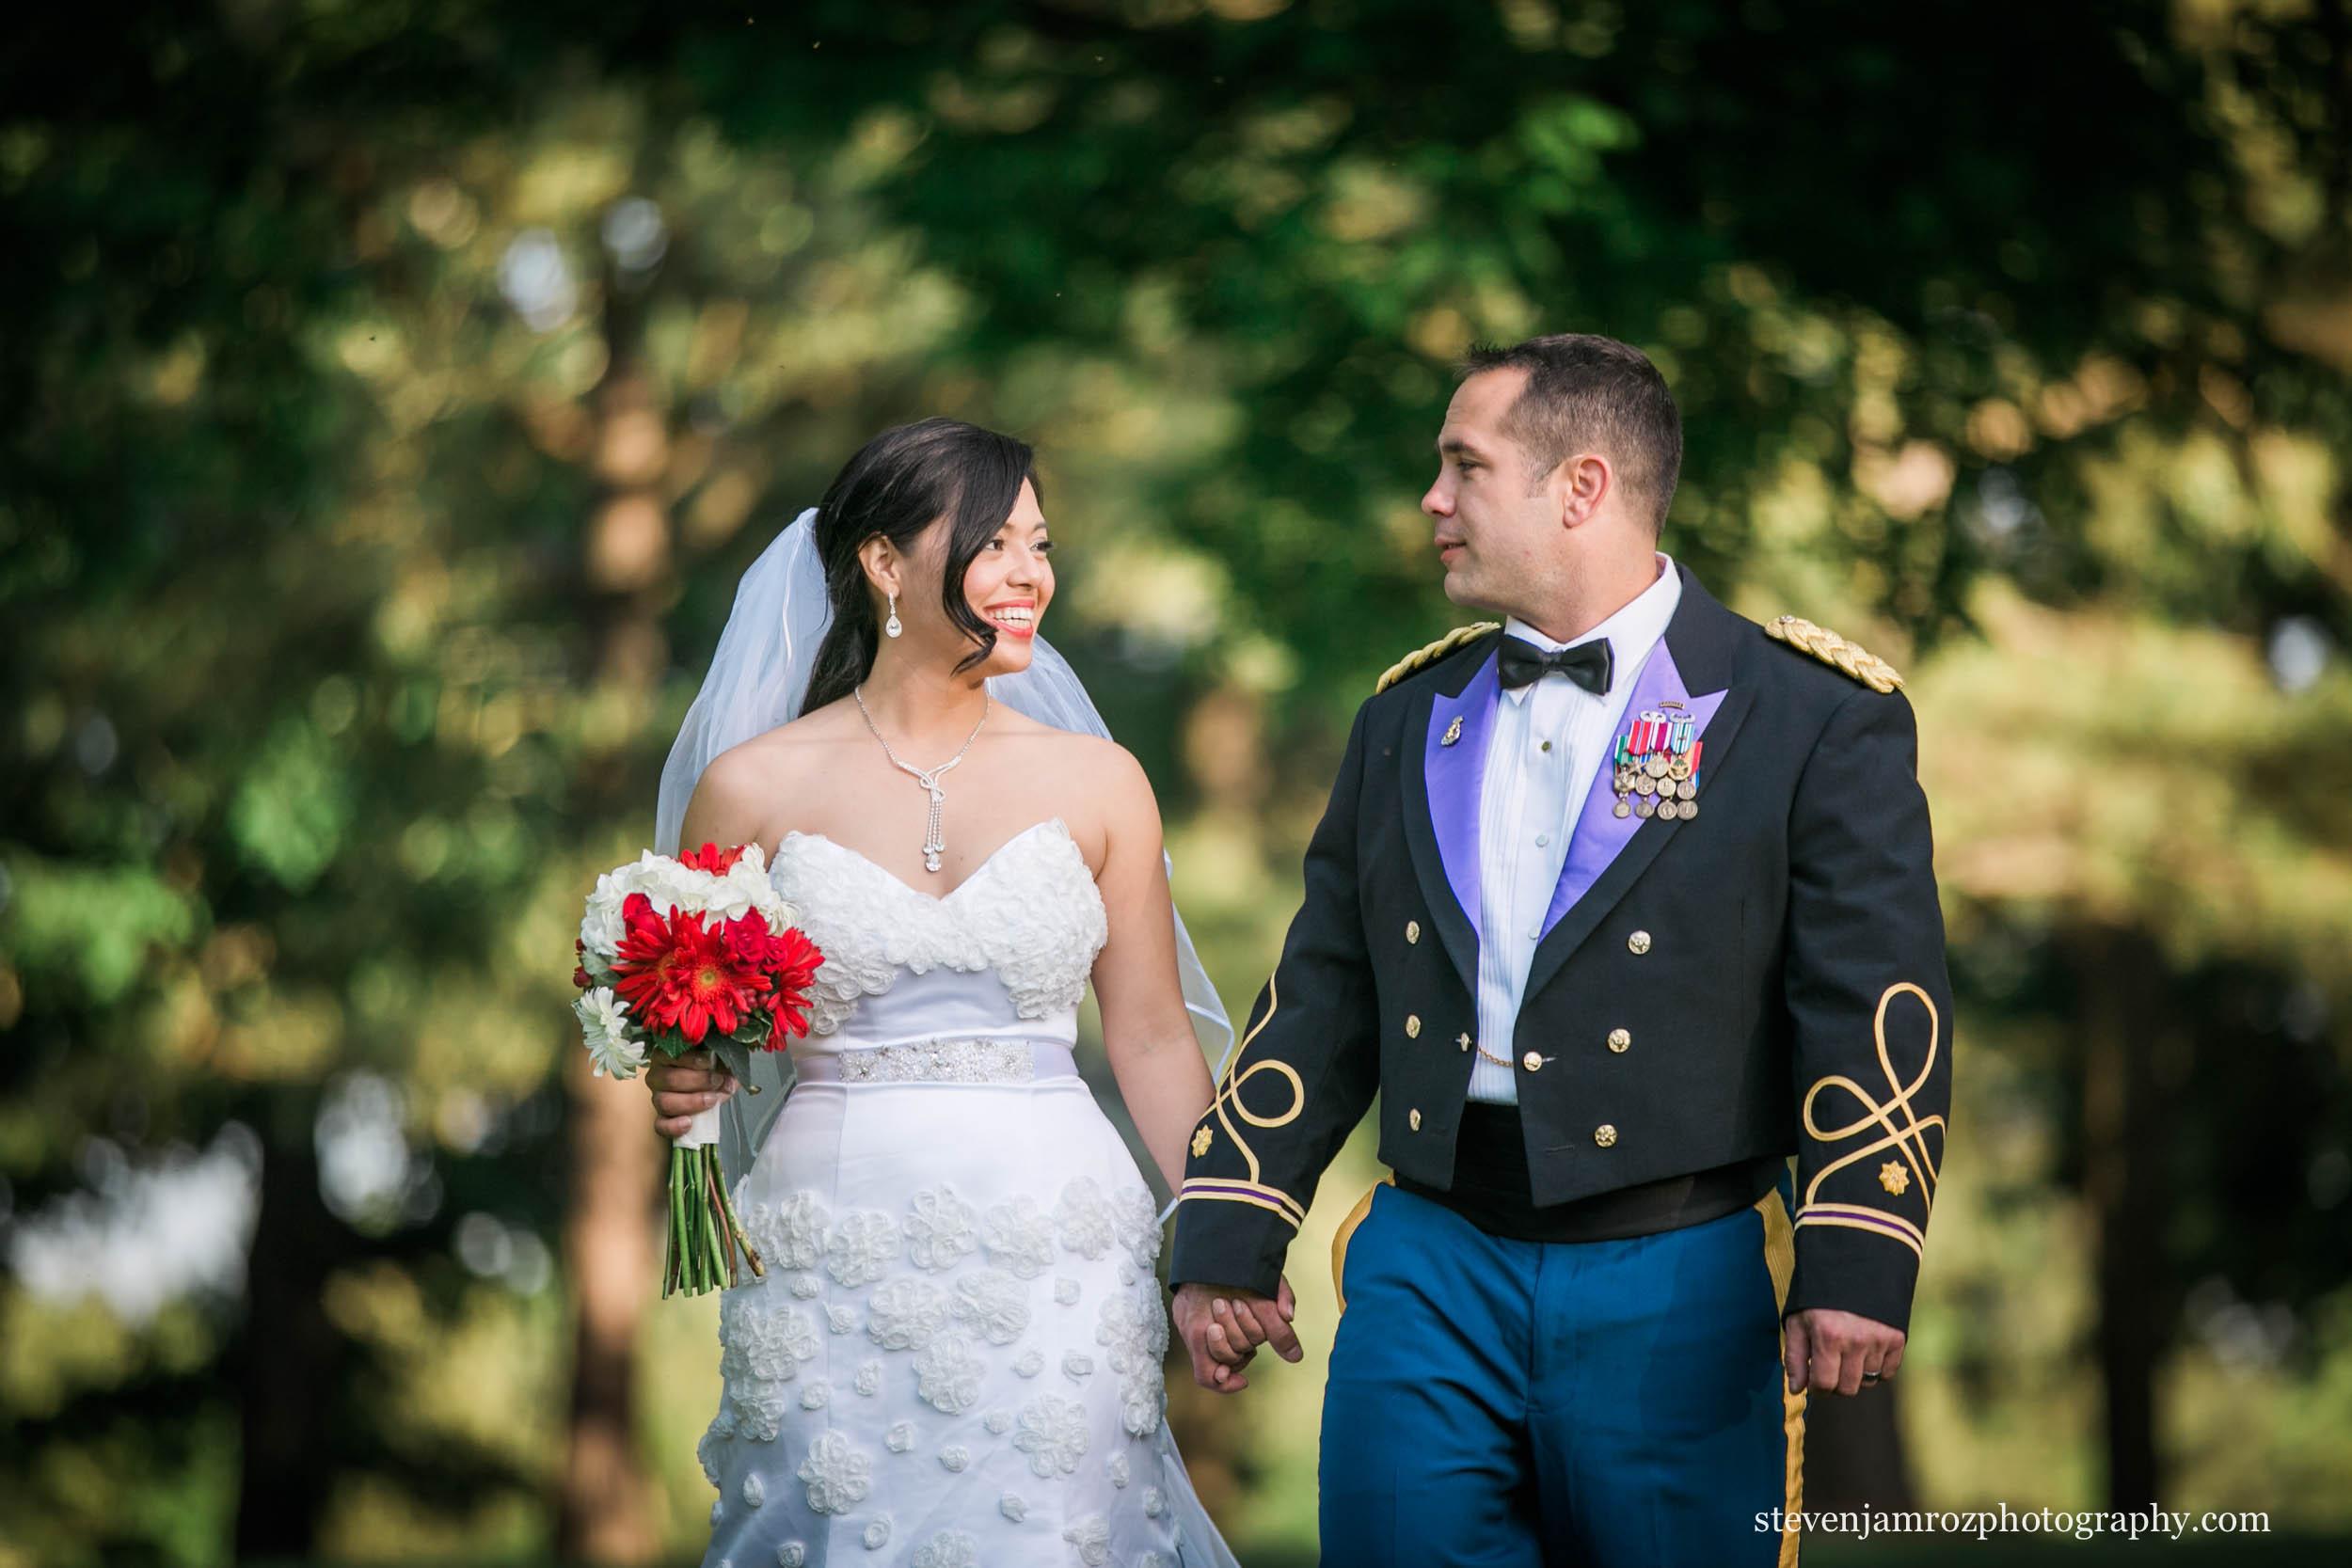 holding-hands-wedding-raleigh-nc-wedding-steven-jamroz-photography-0456.jpg